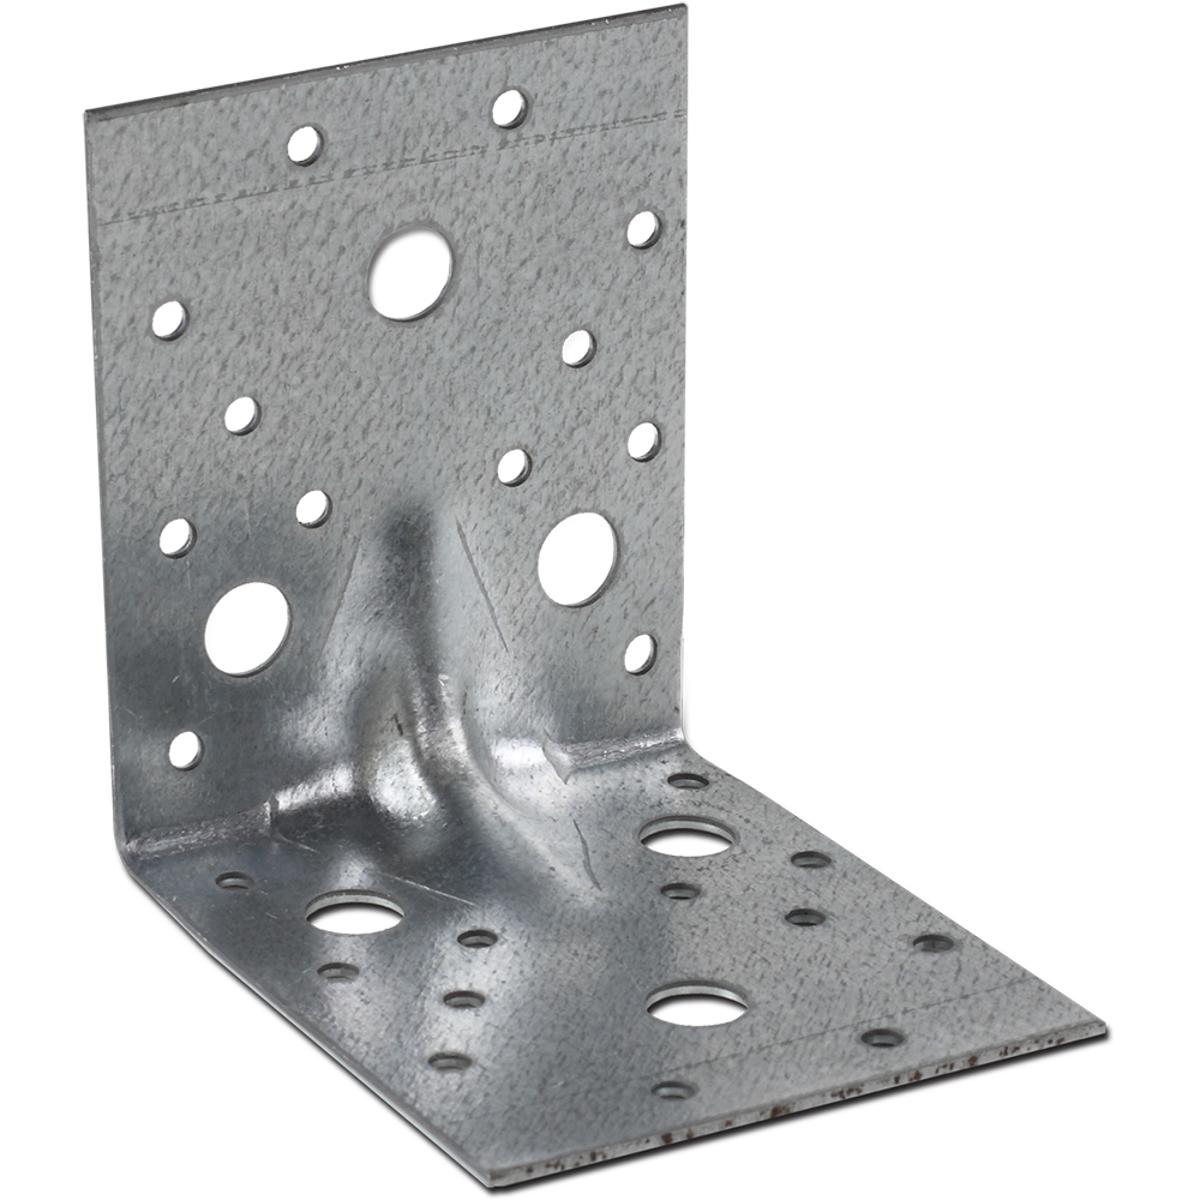 "Крепежный уголок ""Госкрепеж"", усиленный, 50 х 50 х 35 мм, 12 шт КР.090820"